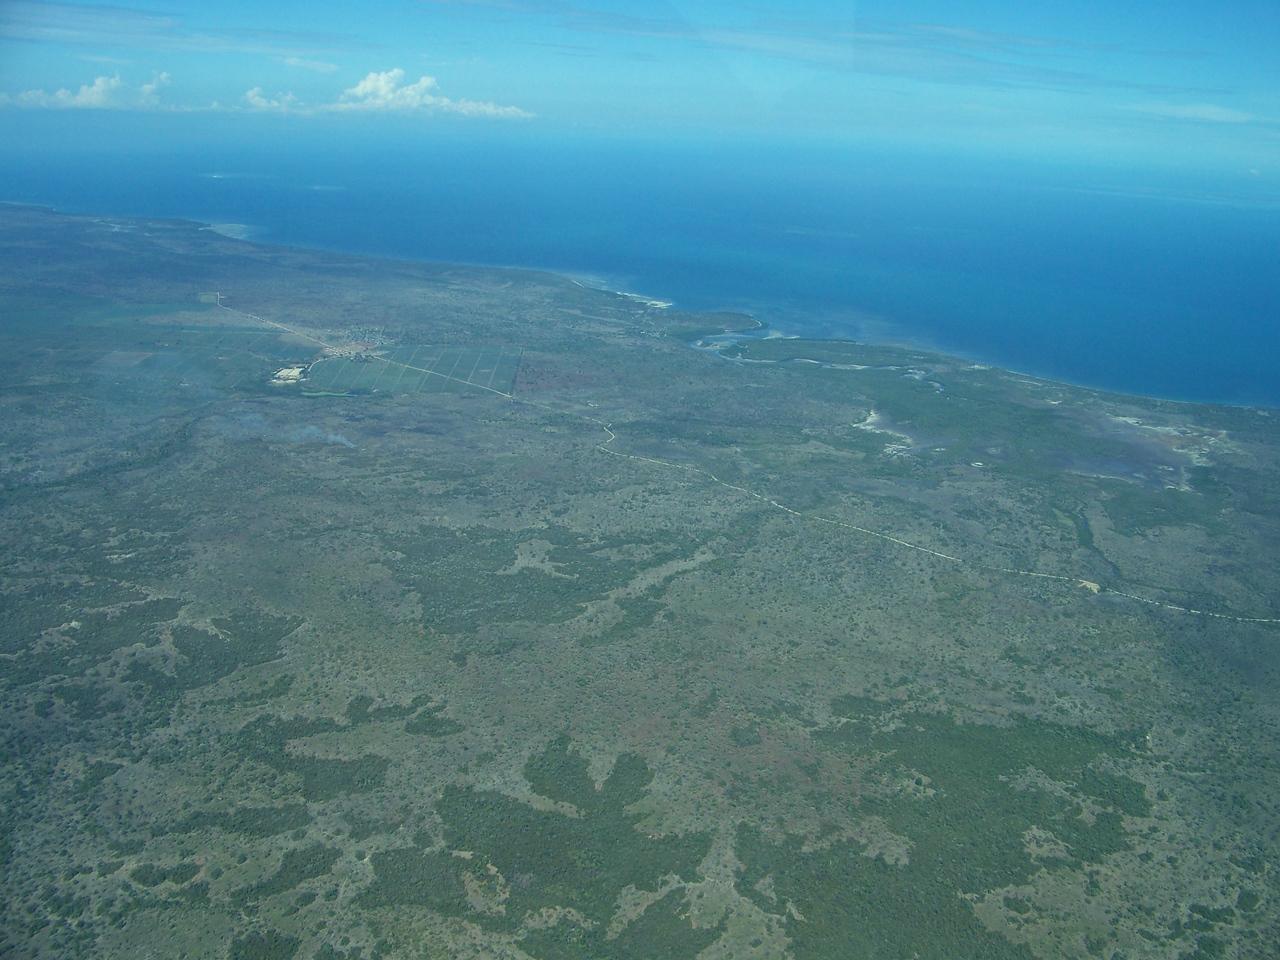 0965 - View of Approaching Coastline of Tanzania from ZanAir Flight from Arusha to Zanzibar - Arusha - Tanzania.JPG